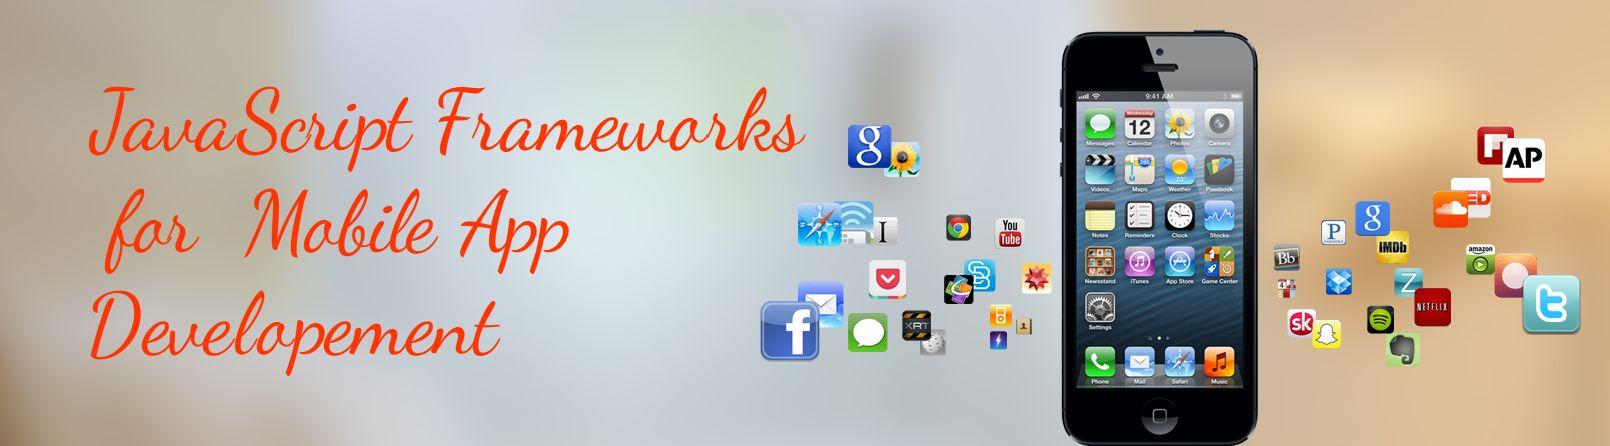 banner-mobile-apps